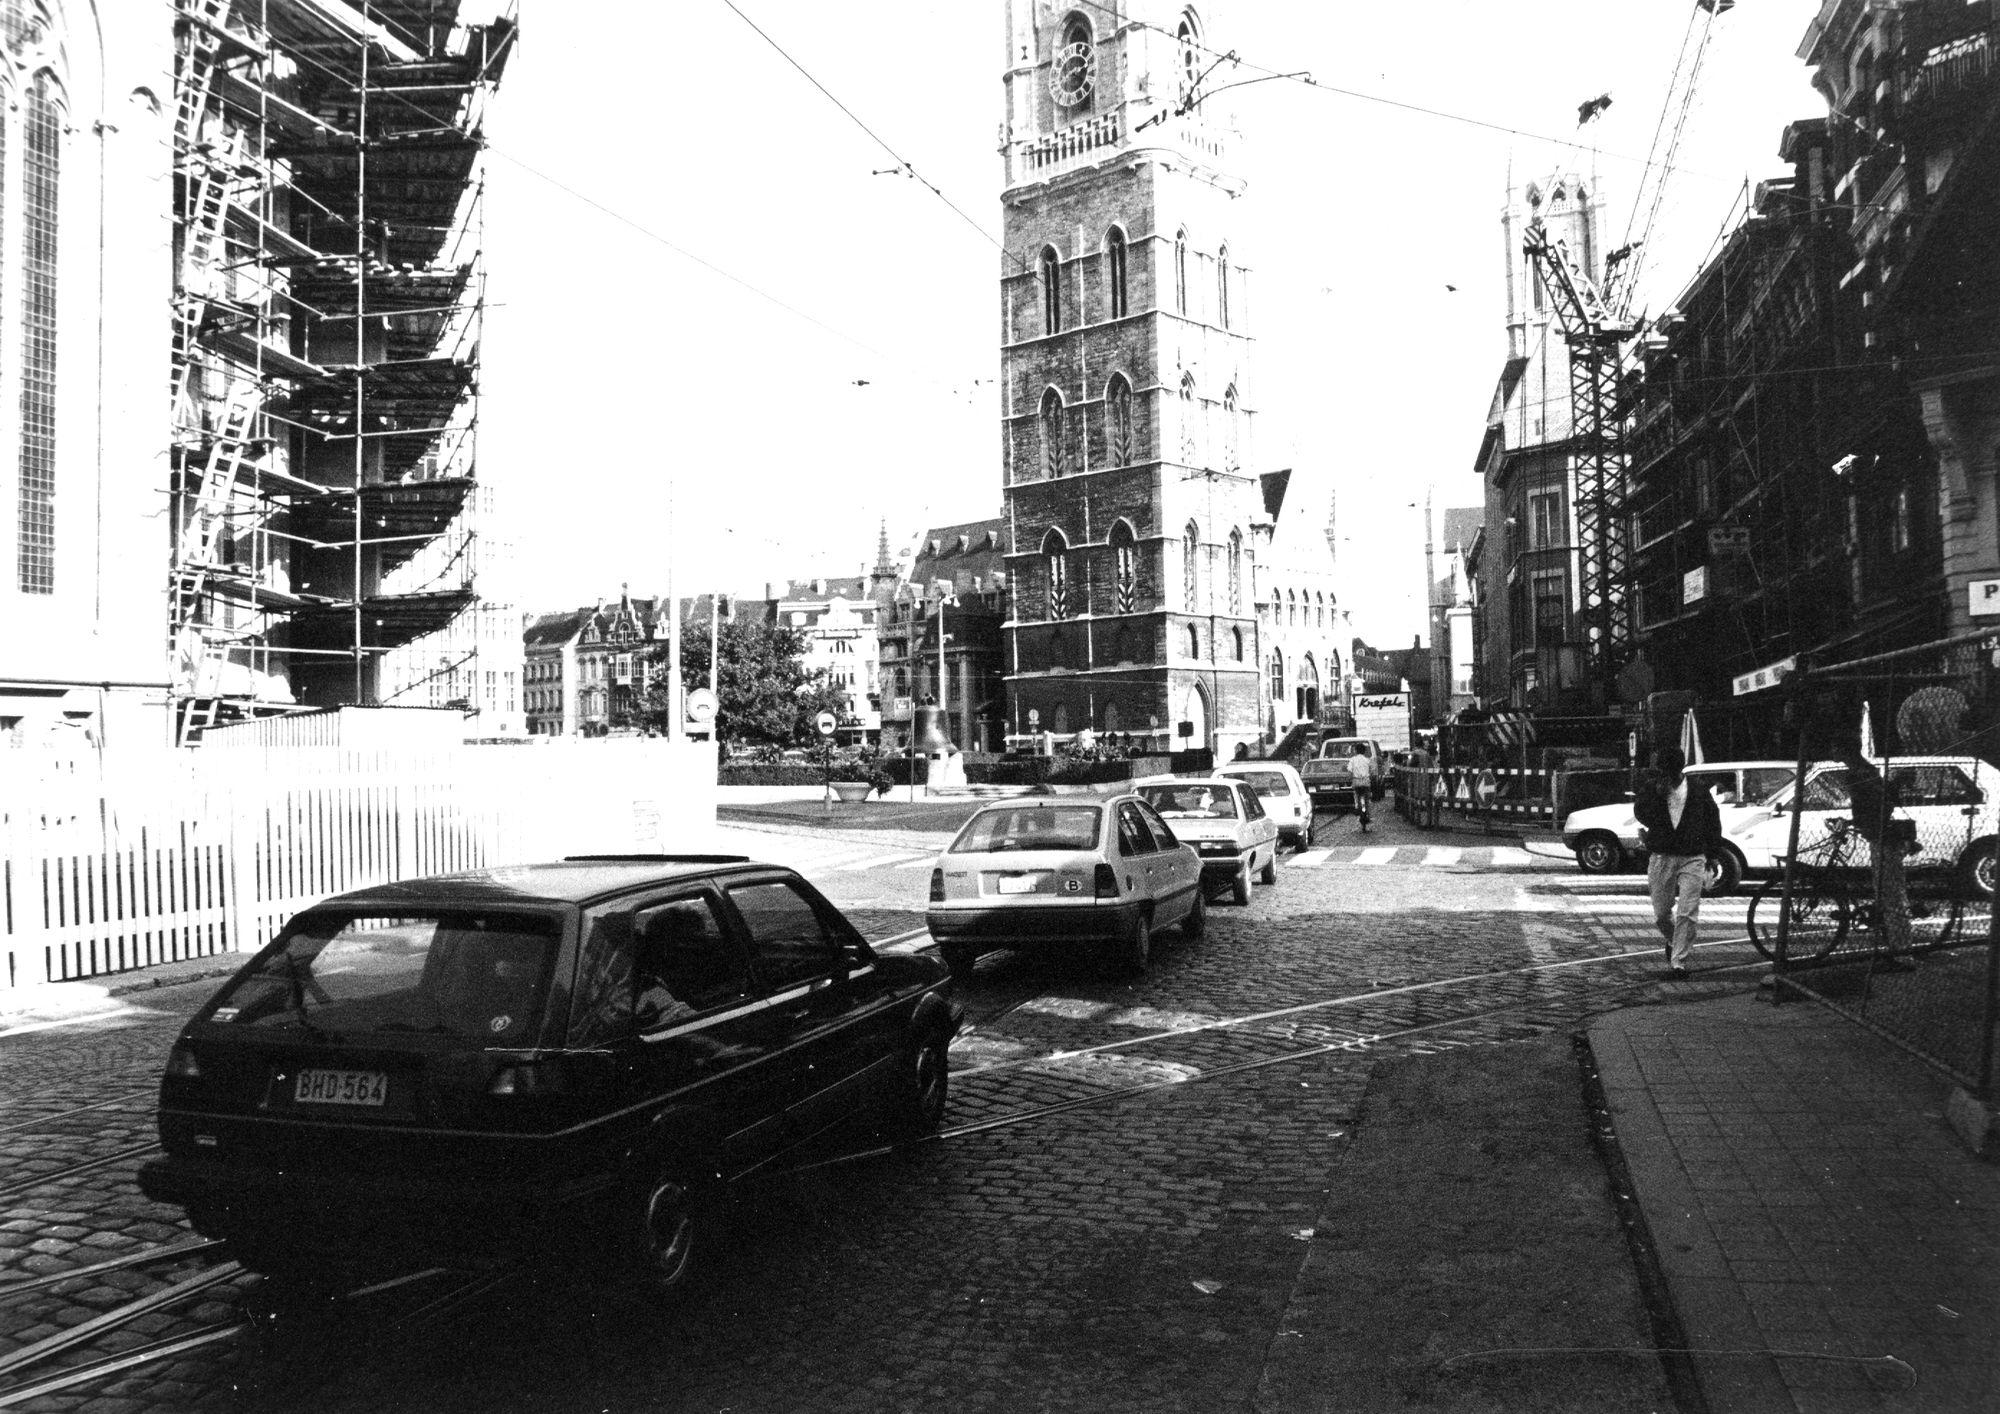 Cataloniëstraat09_1986.jpg